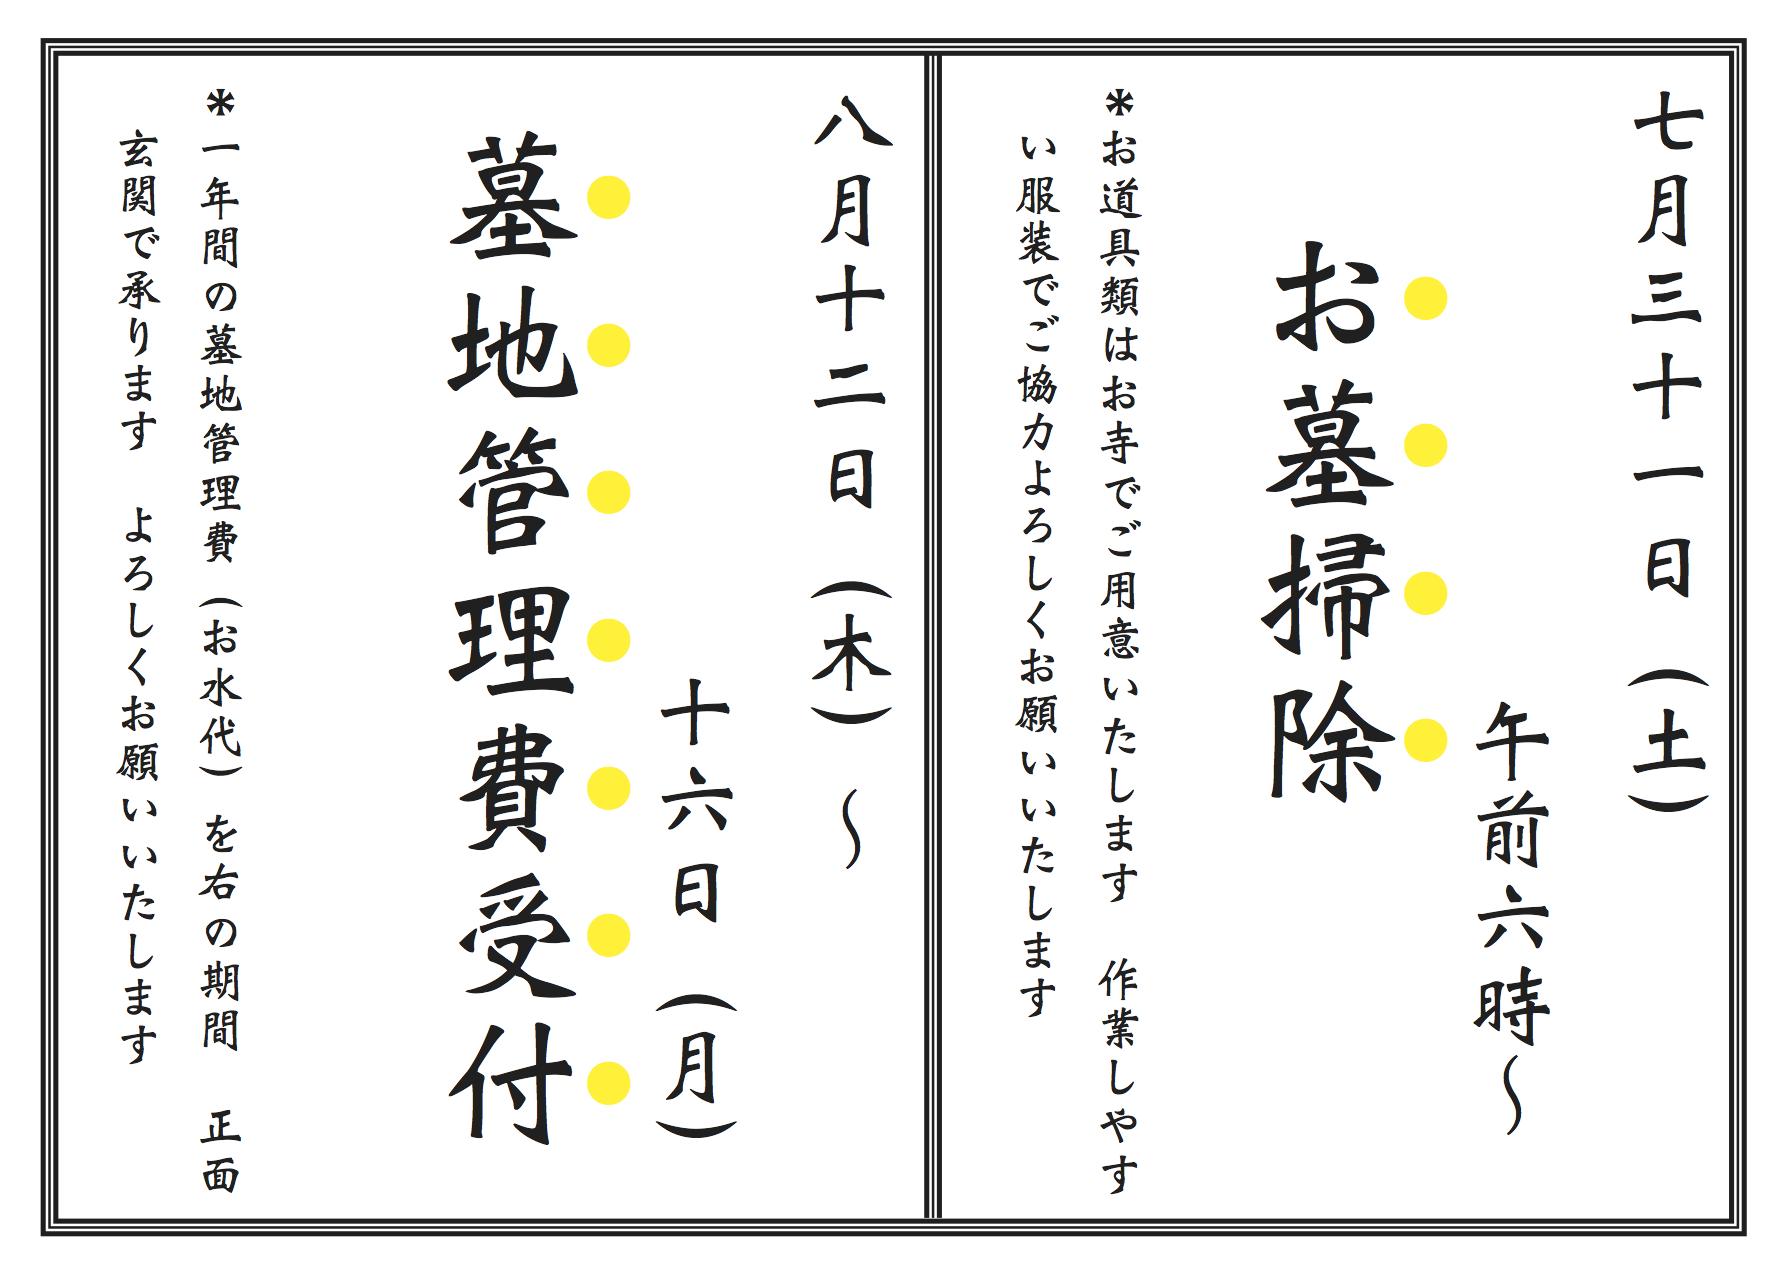 soji_kanrihi_keiji.png